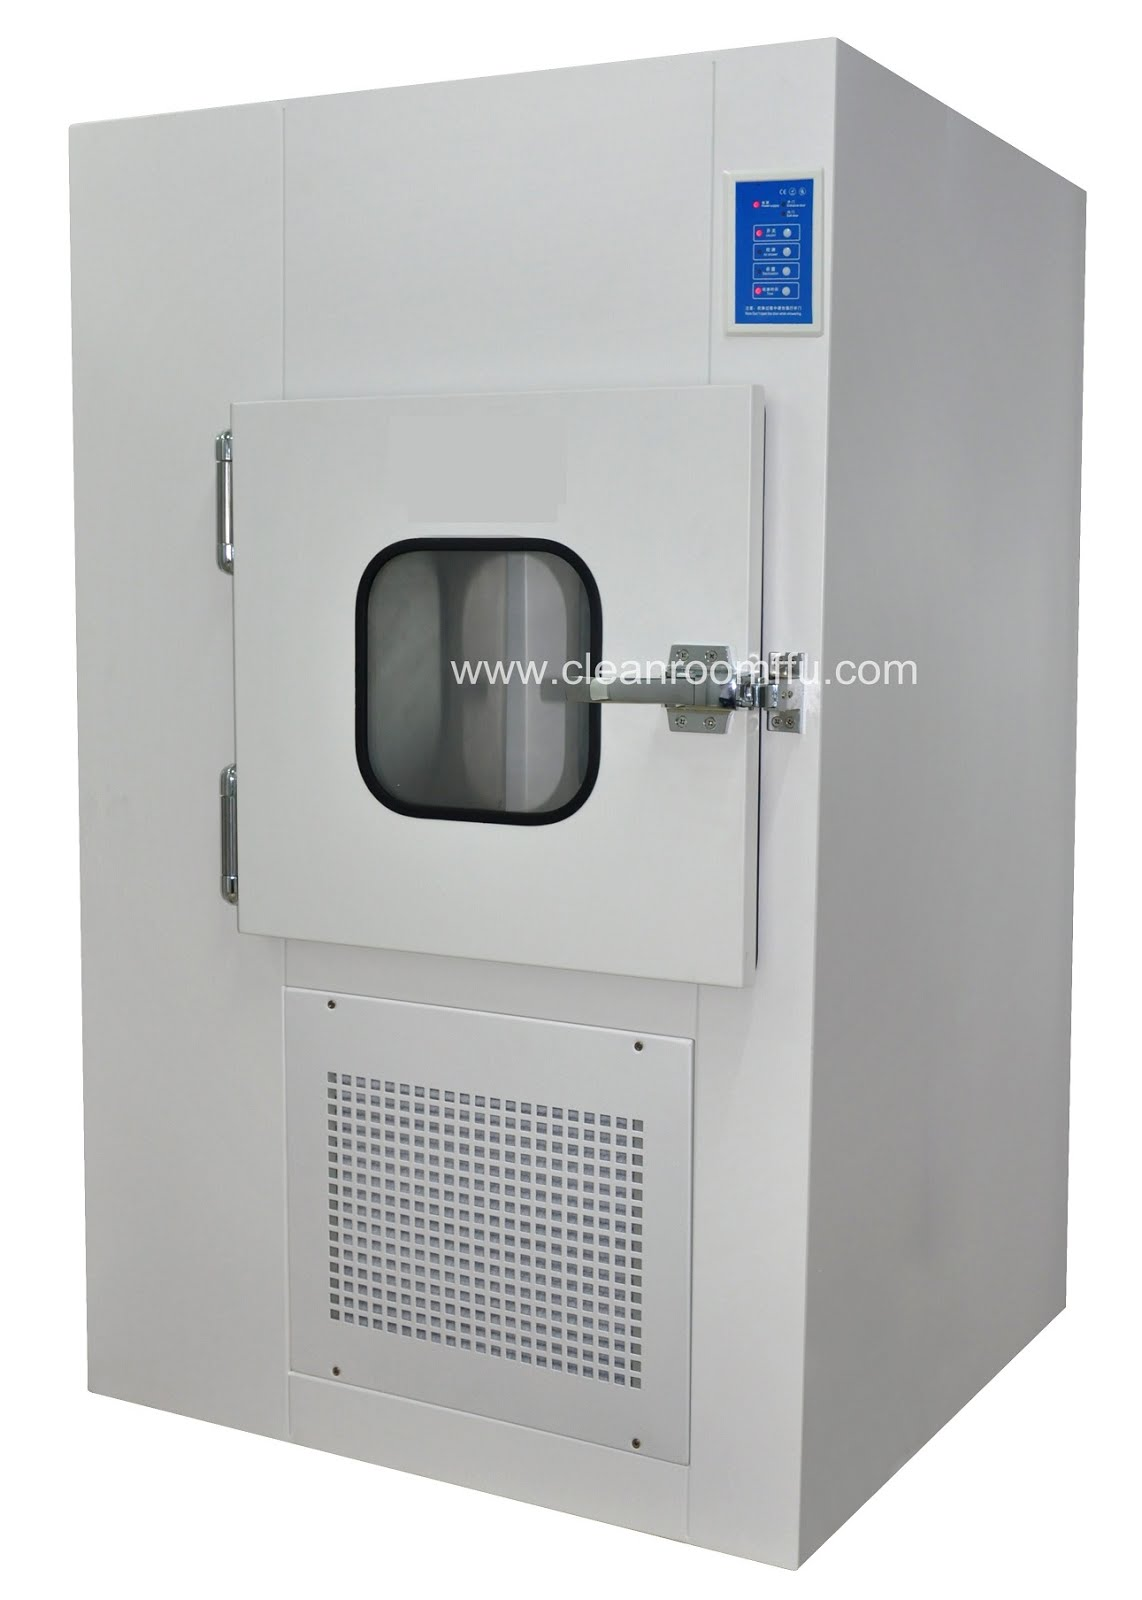 Cleanroom Pass Through Box with Air Shower